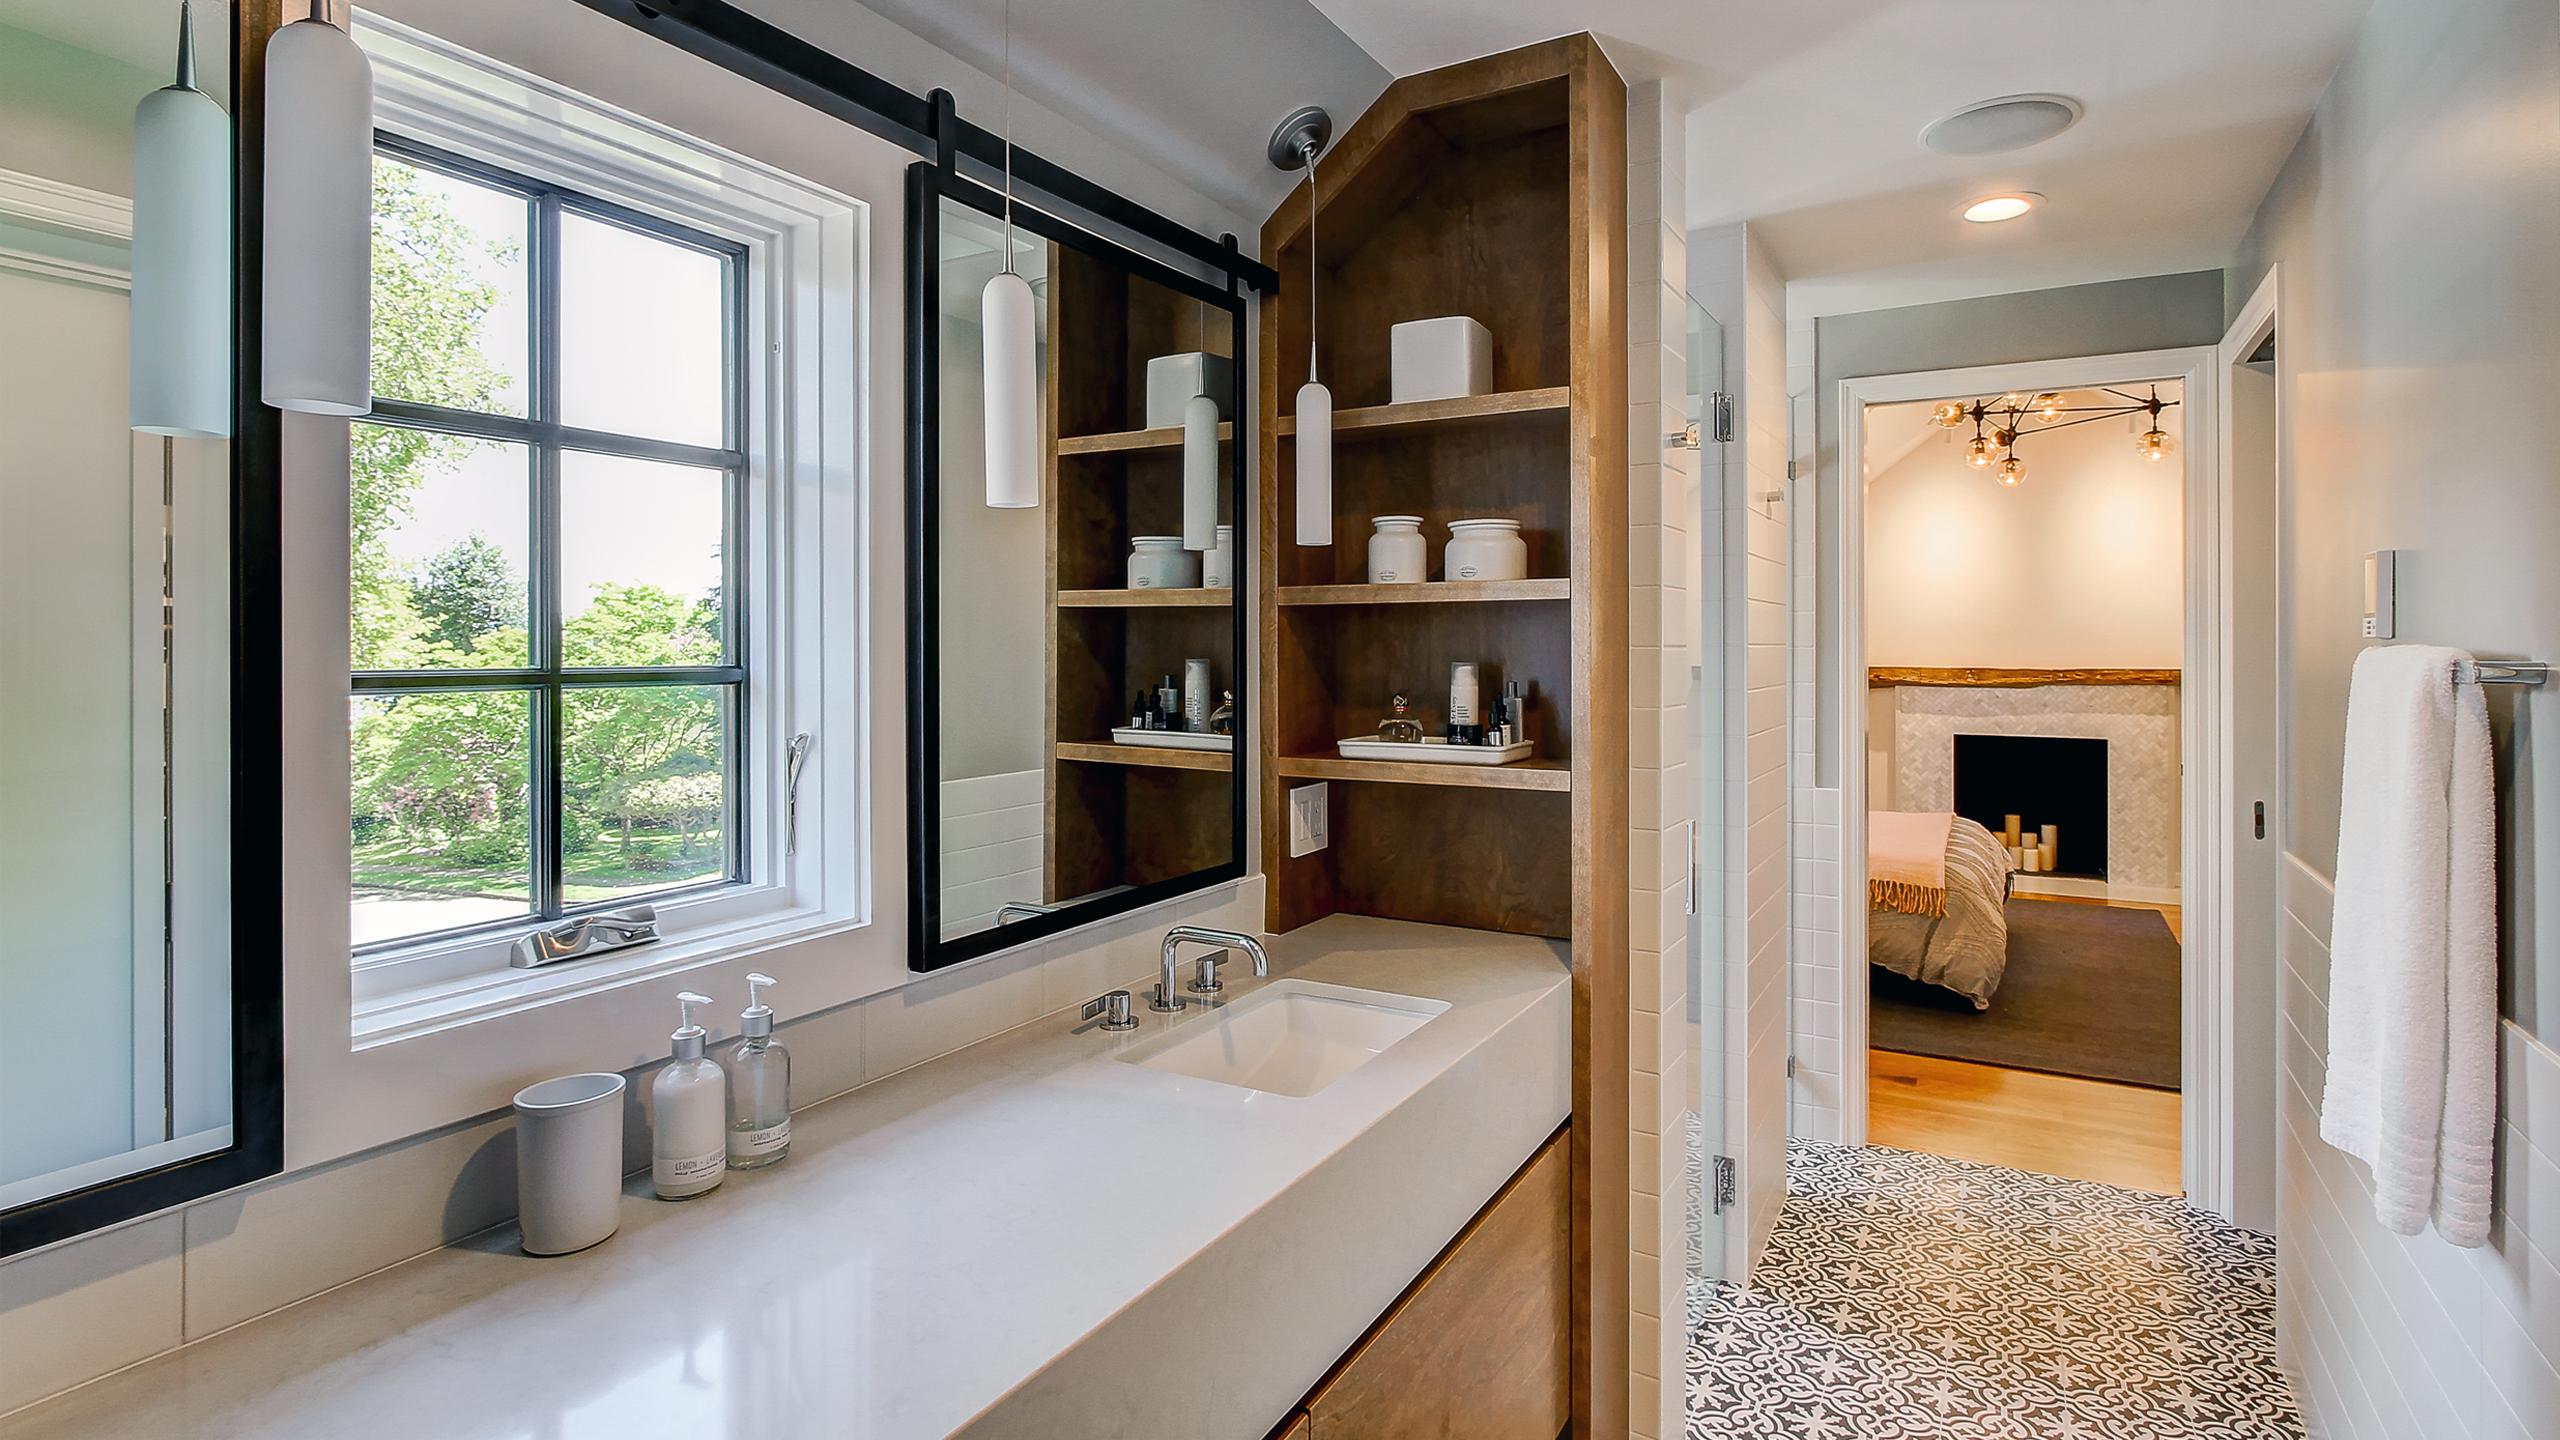 Cost Remodel Bathroom Per Square Foot 4k Wiki Wallpapers